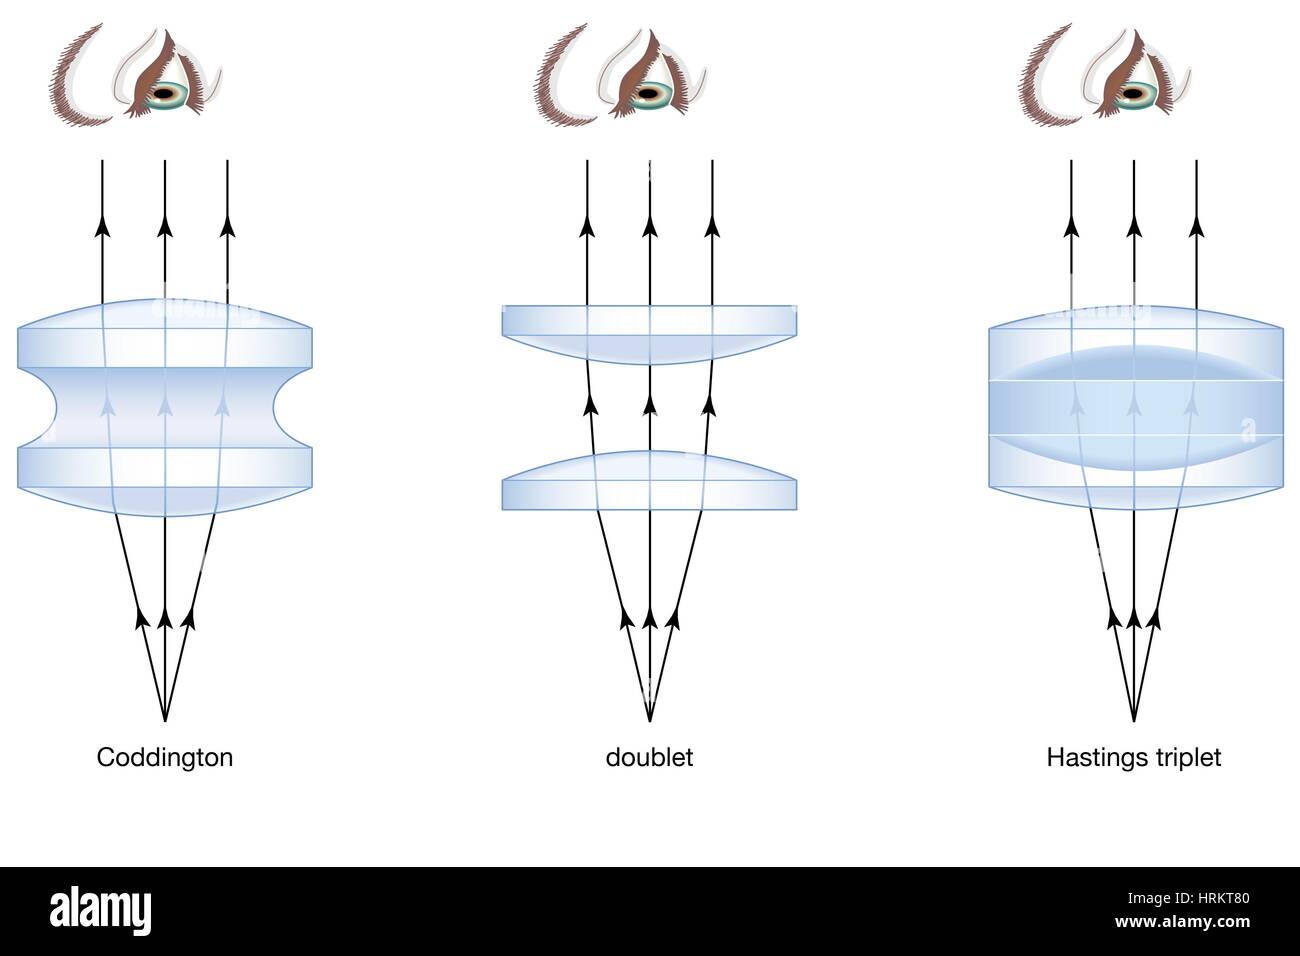 Trois formes de loupes, doublet, triplet Coddington, Hastings, microscope, microscopie Photo Stock